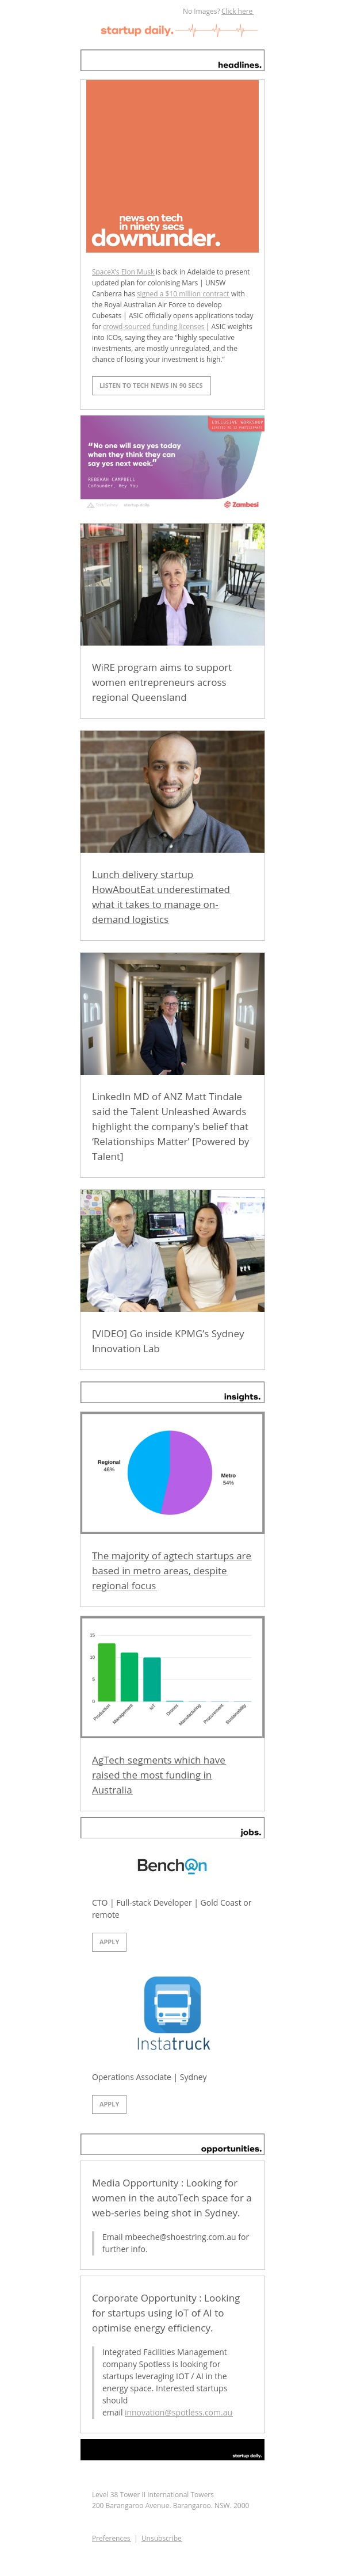 WiRE program aims to support women entrepreneurs across regional Queensland | Go inside KPMG's Sydney Innovation Lab